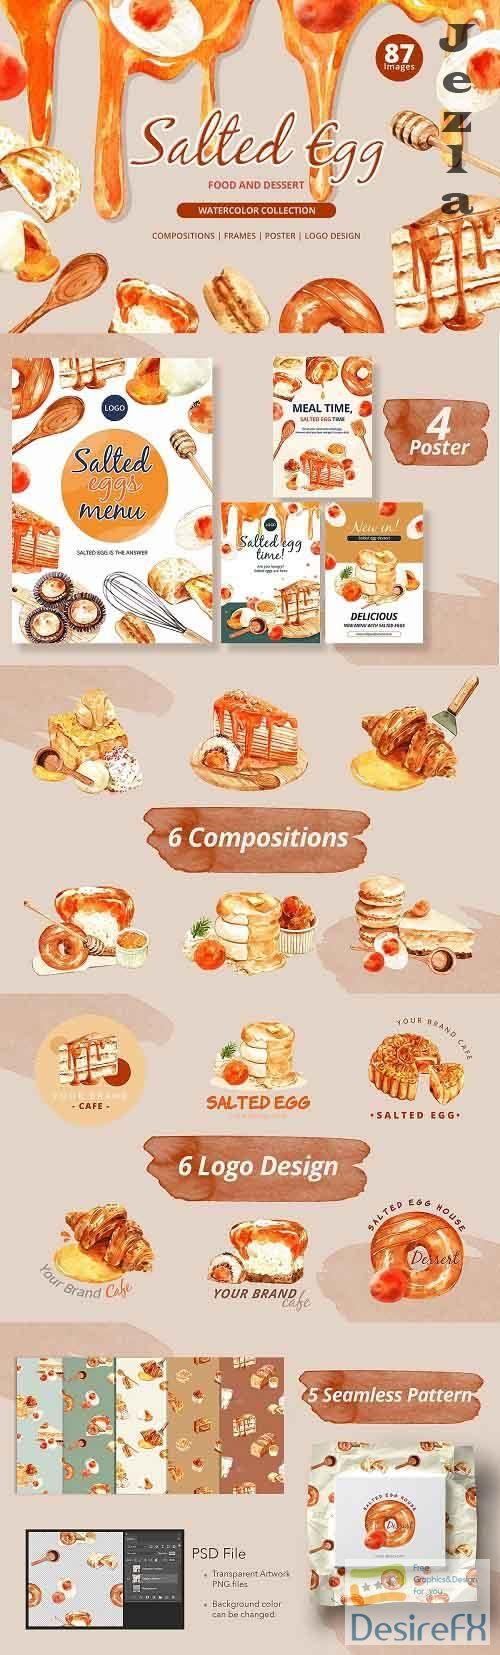 Salted Egg Food and Dessert Set - 5529704